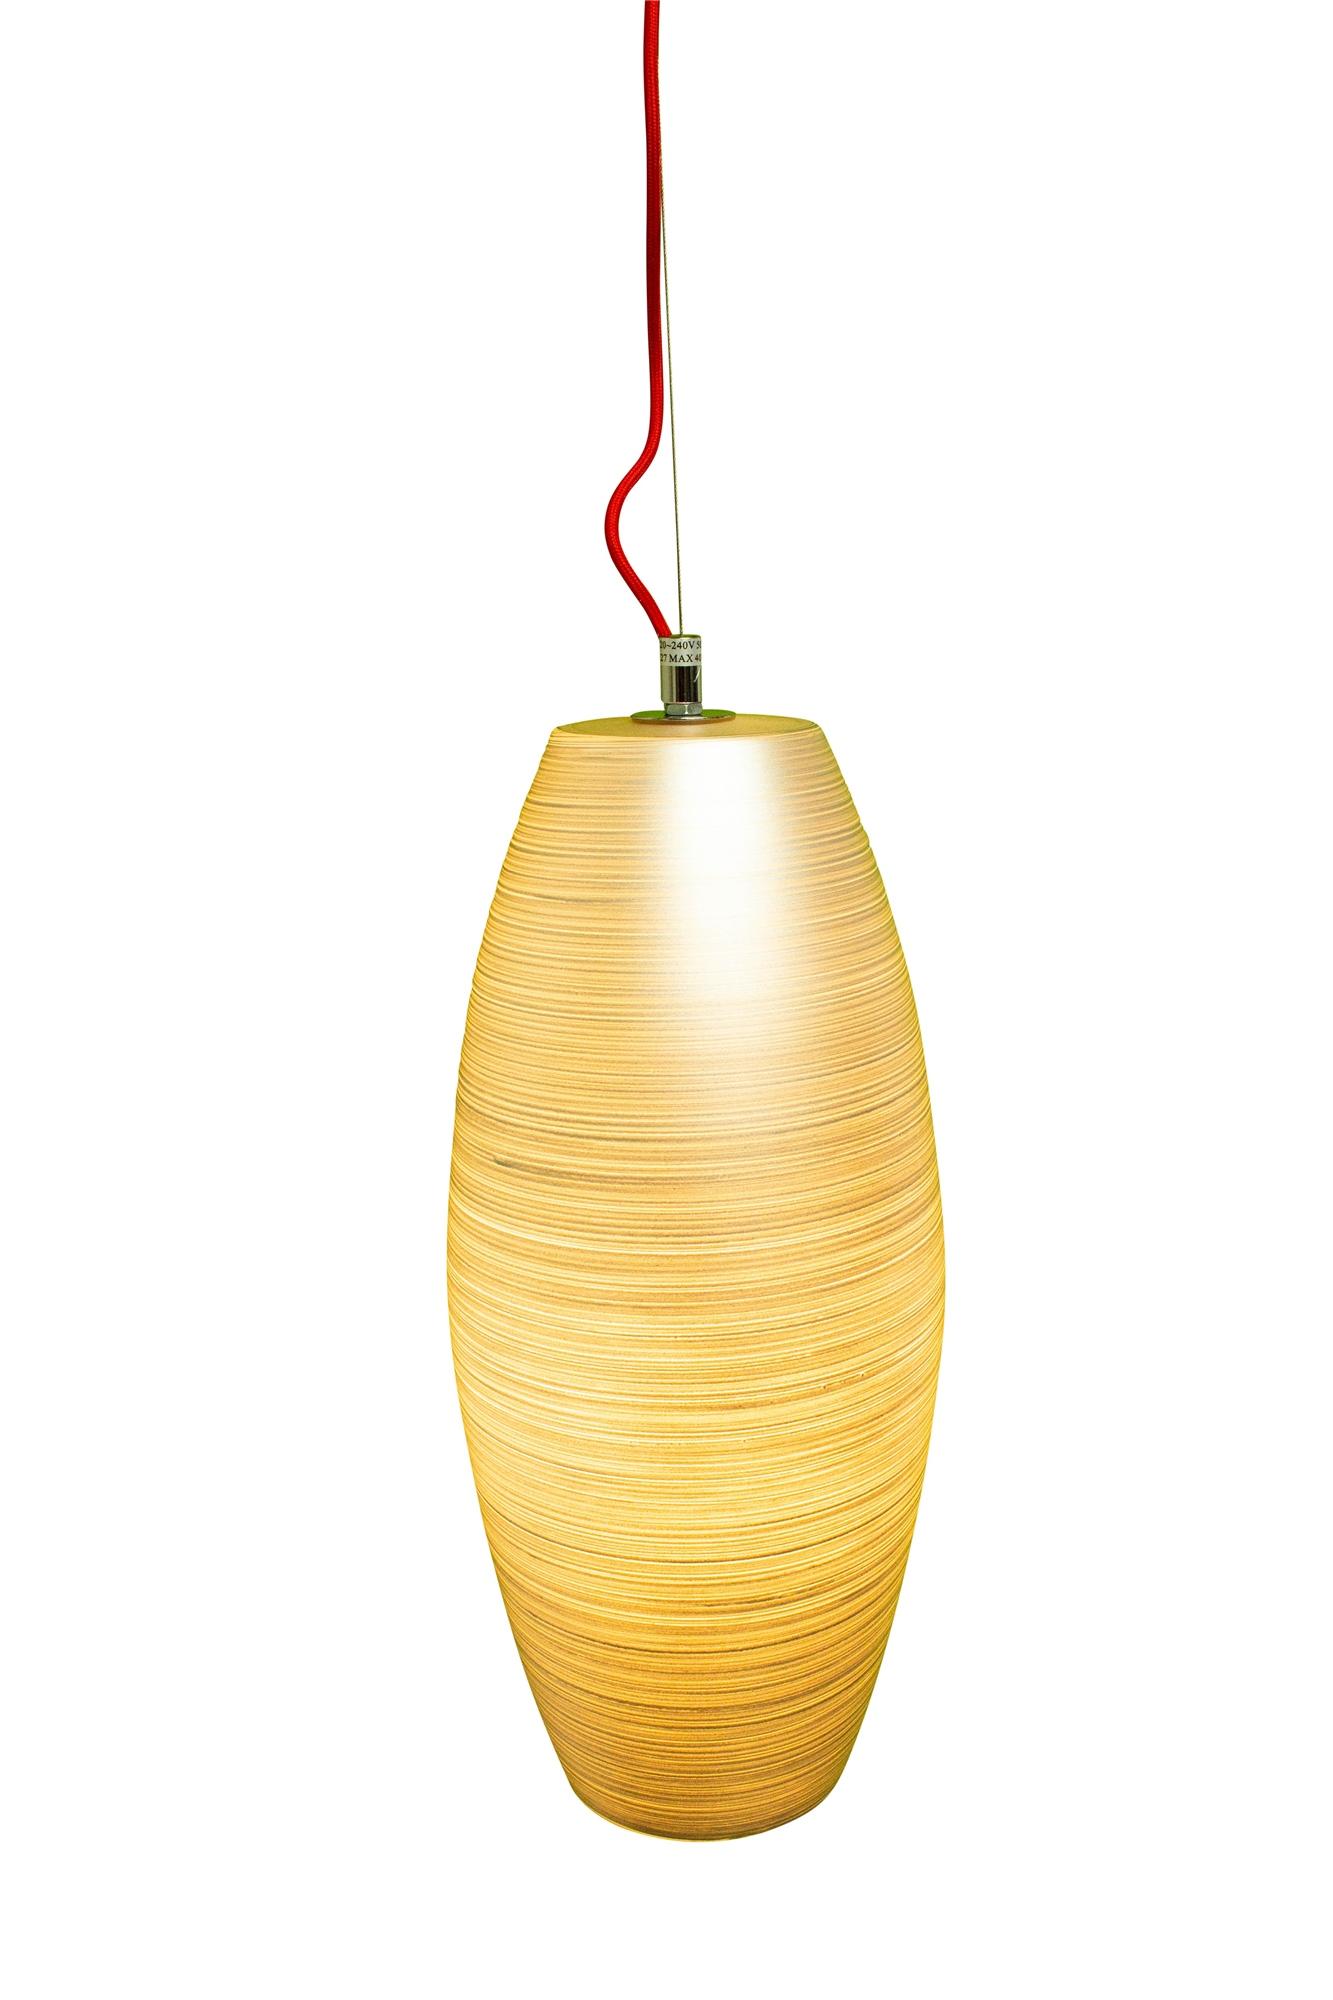 Lampenlux LED Pendellampe Pendelleuchte Biko Glasschirm Silber Fassung E27